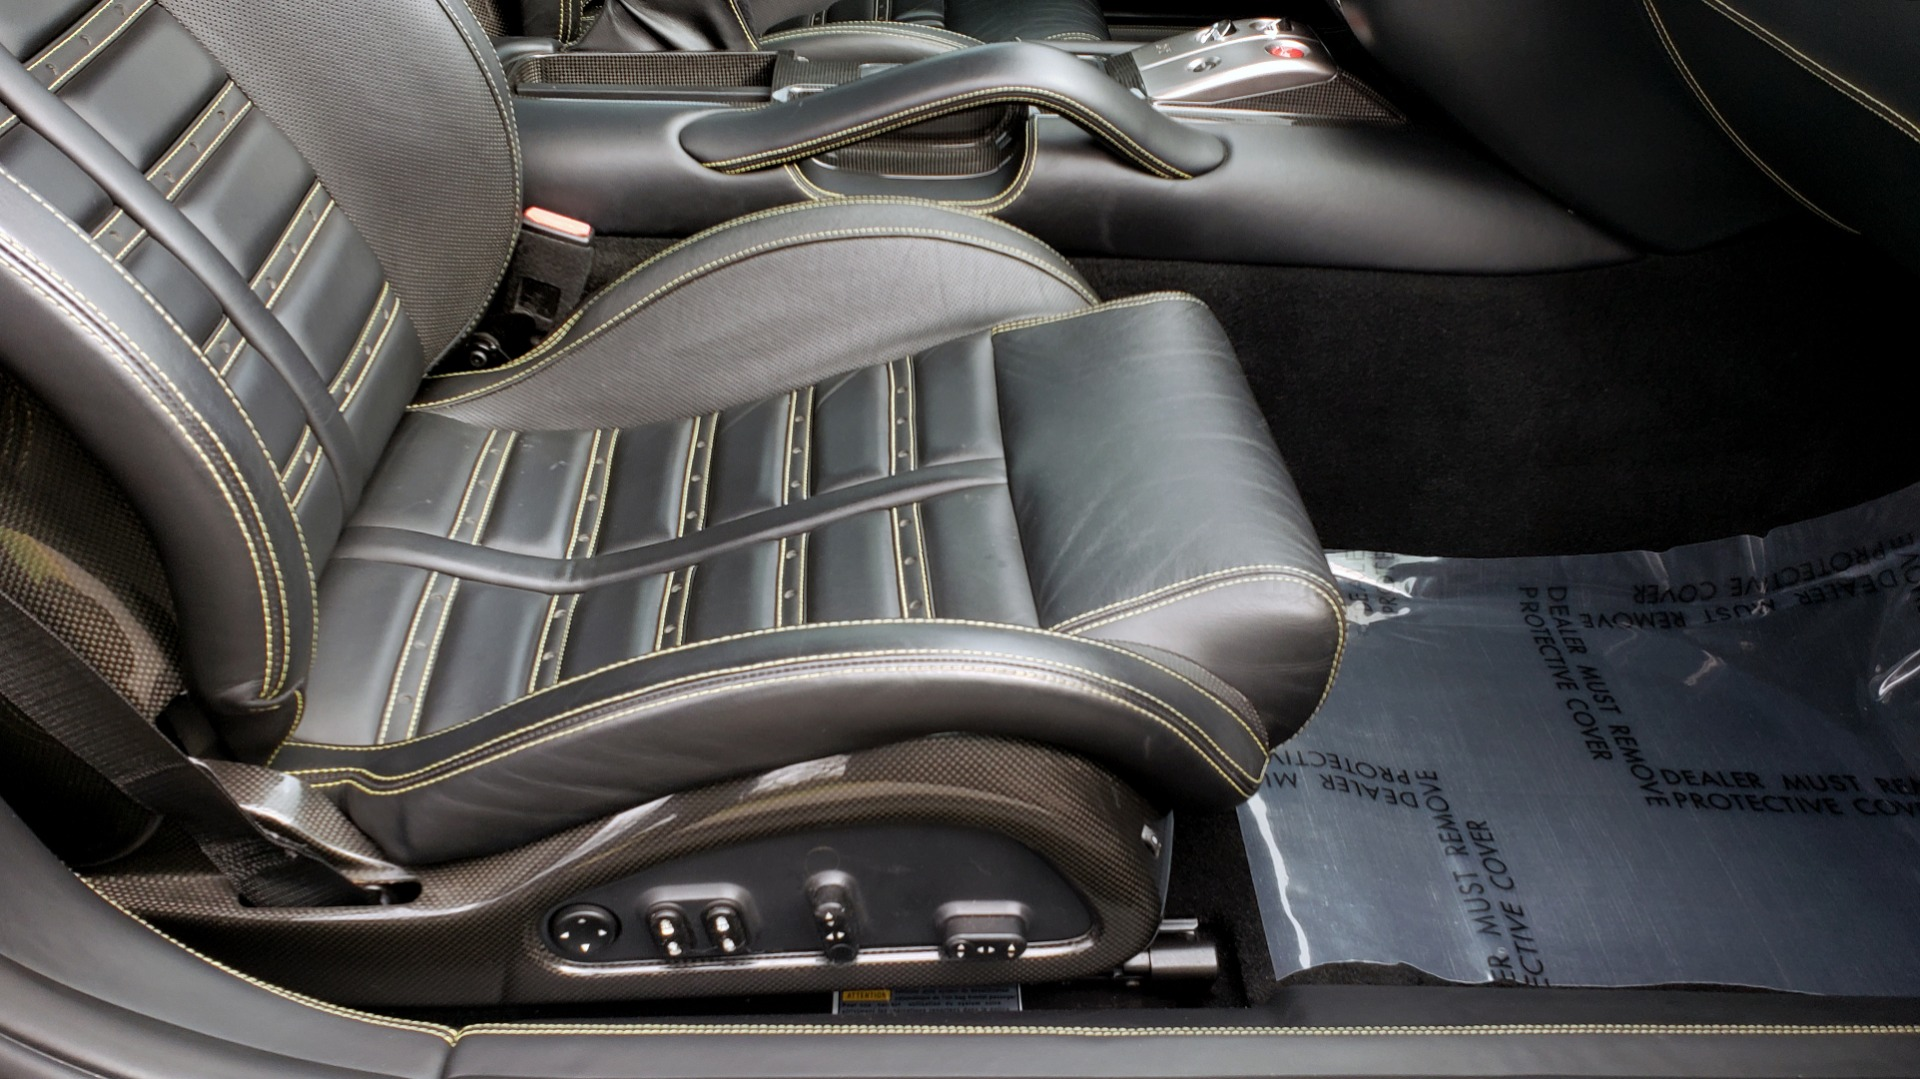 Used 2007 Ferrari 599 GTB FIORANO HGTE / V12 / F1 TRANS / NAV / BOSE / CUSTOM WHEELS for sale $109,999 at Formula Imports in Charlotte NC 28227 38